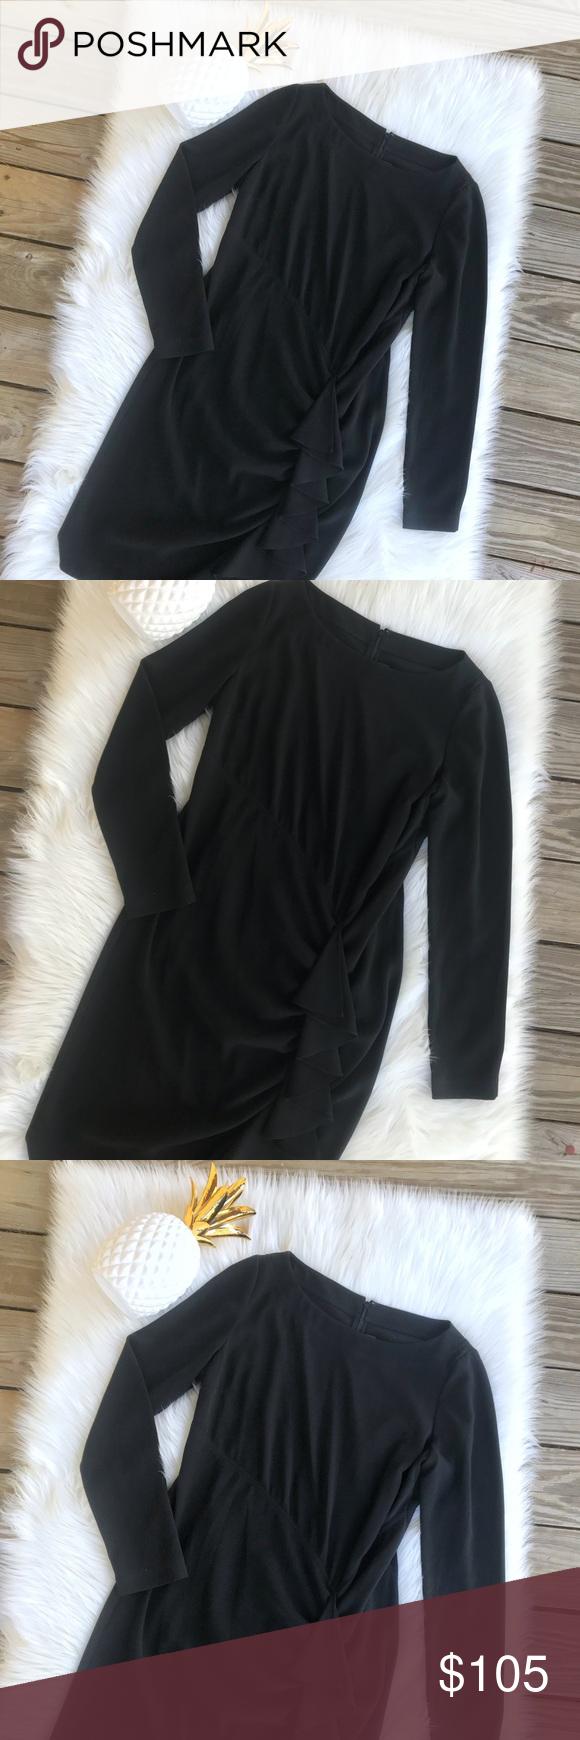 St john couture black long sleeve ruffle dress absolutely stunning